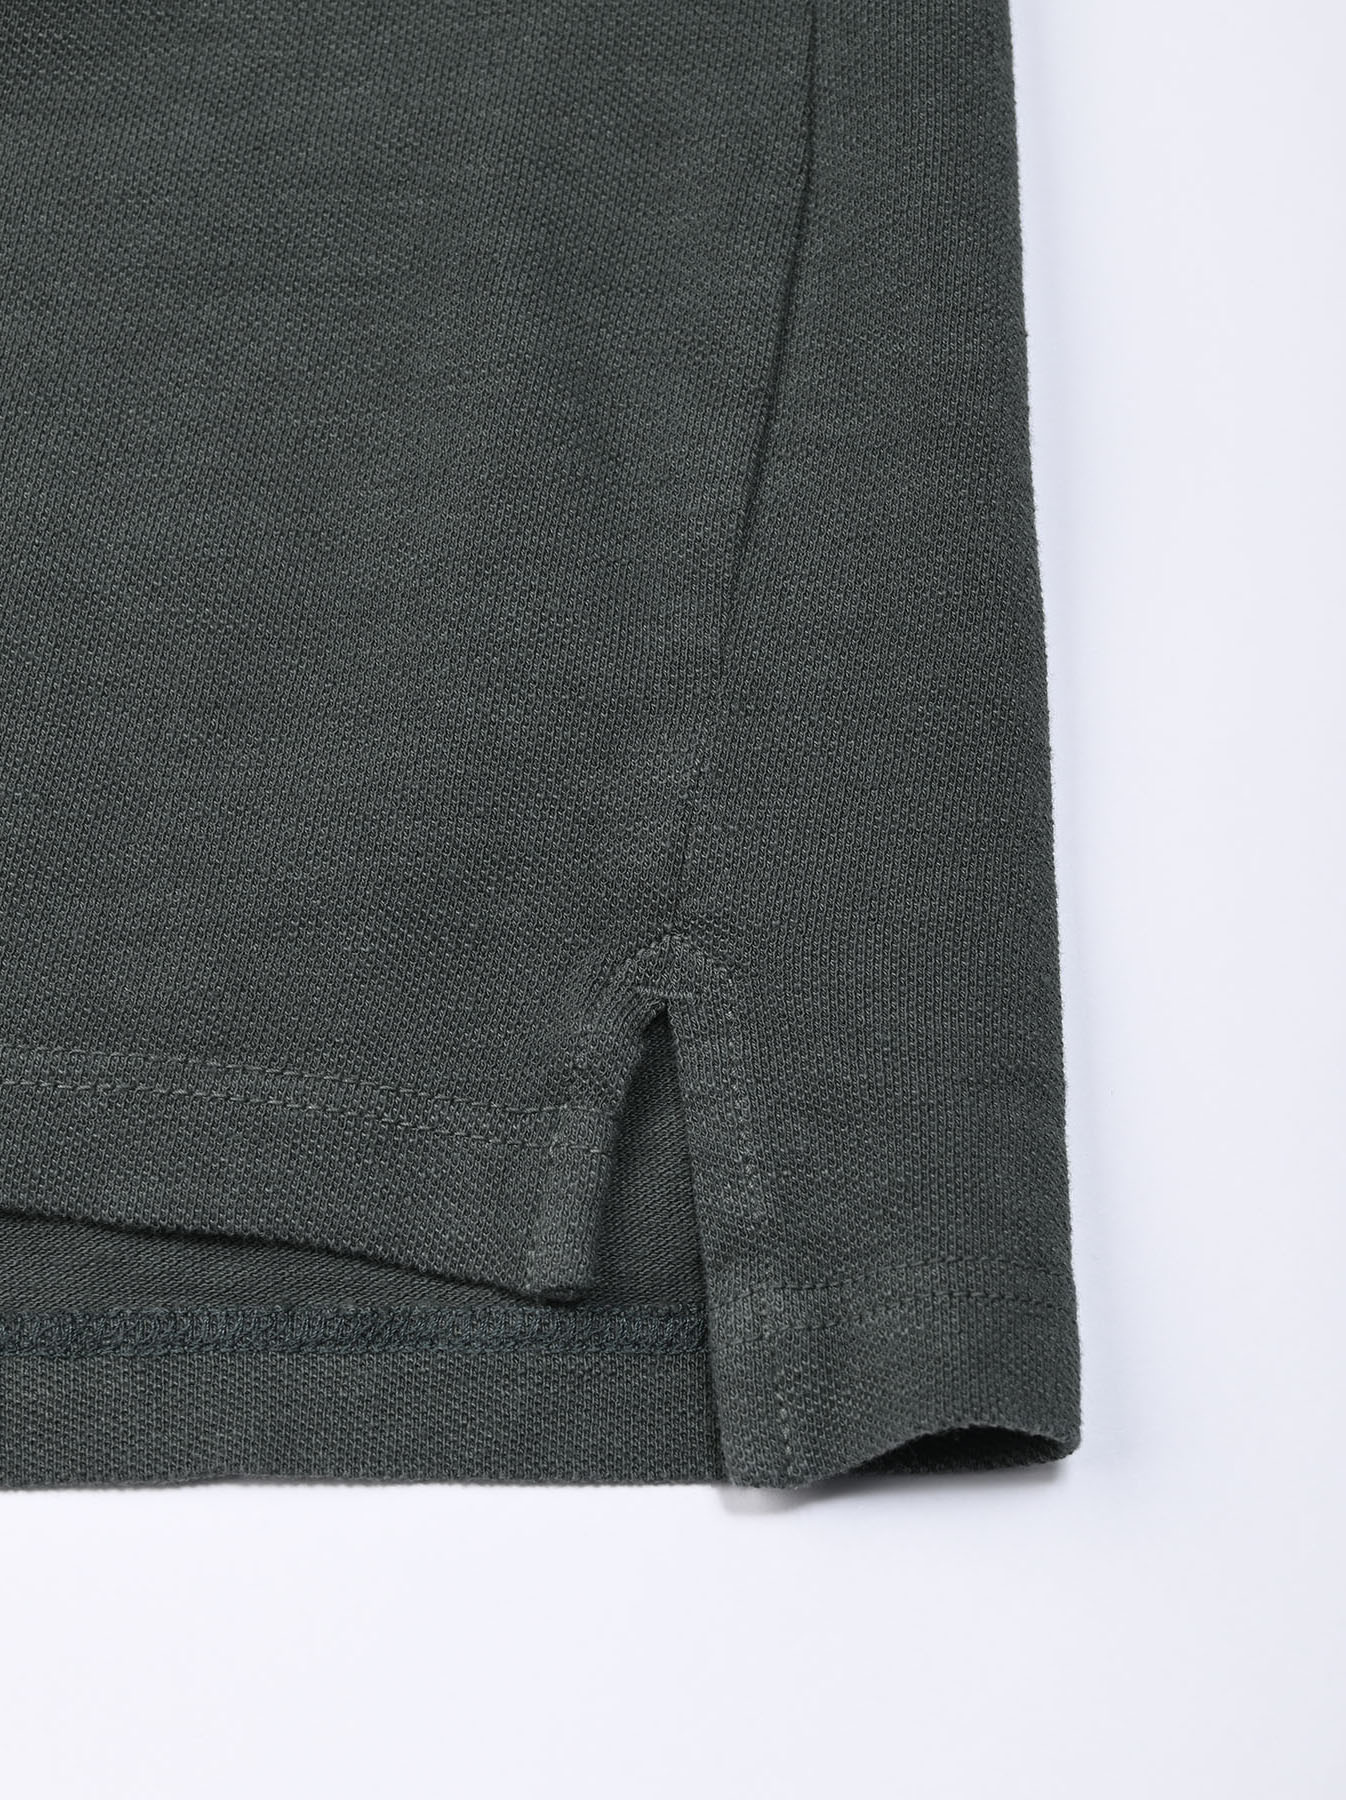 Kanoko Ocean Shiokaze Short-sleeved Polo Dress (0521)-12